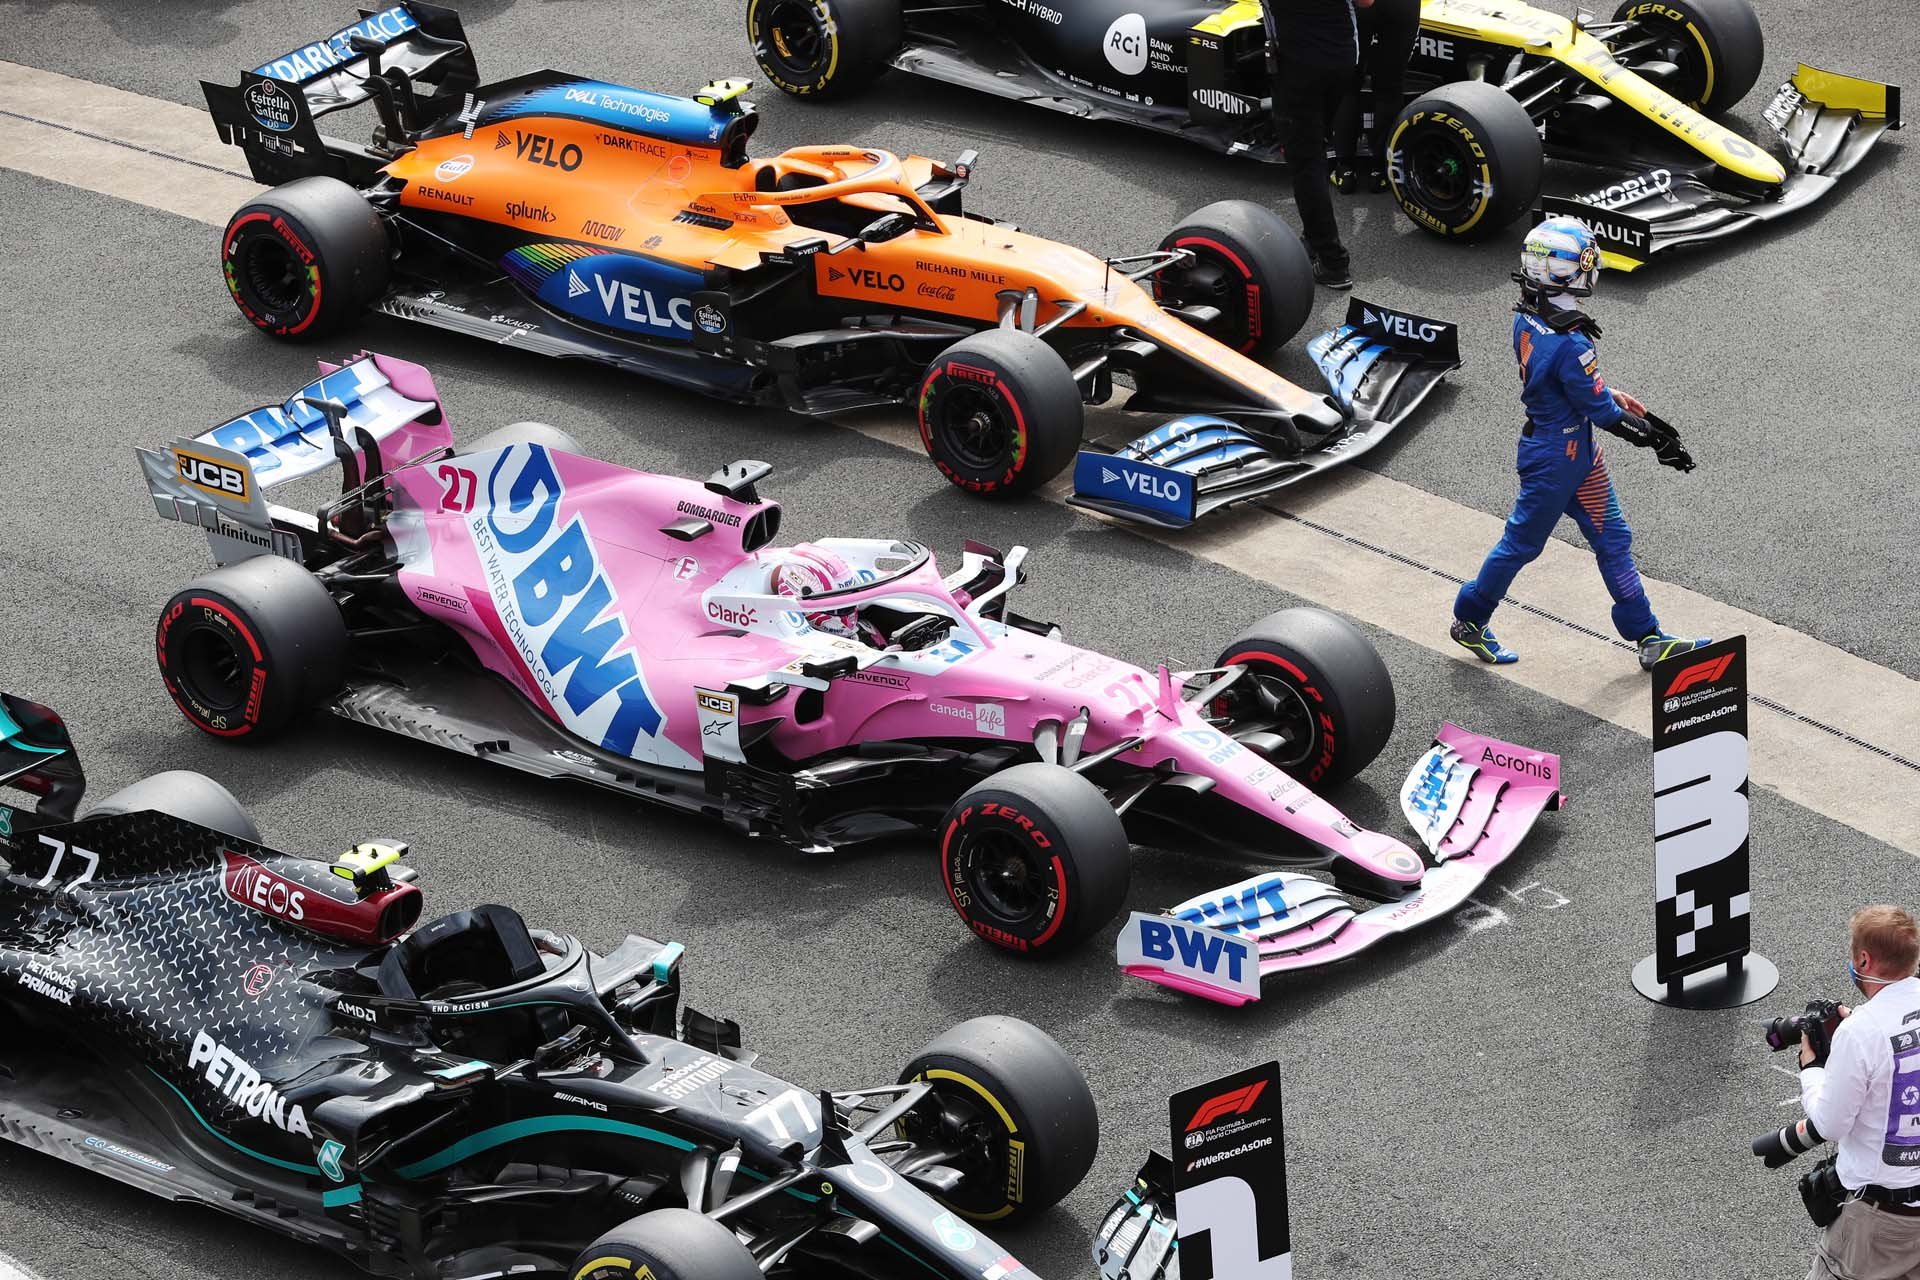 Lando Norris, McLaren, in Parc Ferme after Qualifying